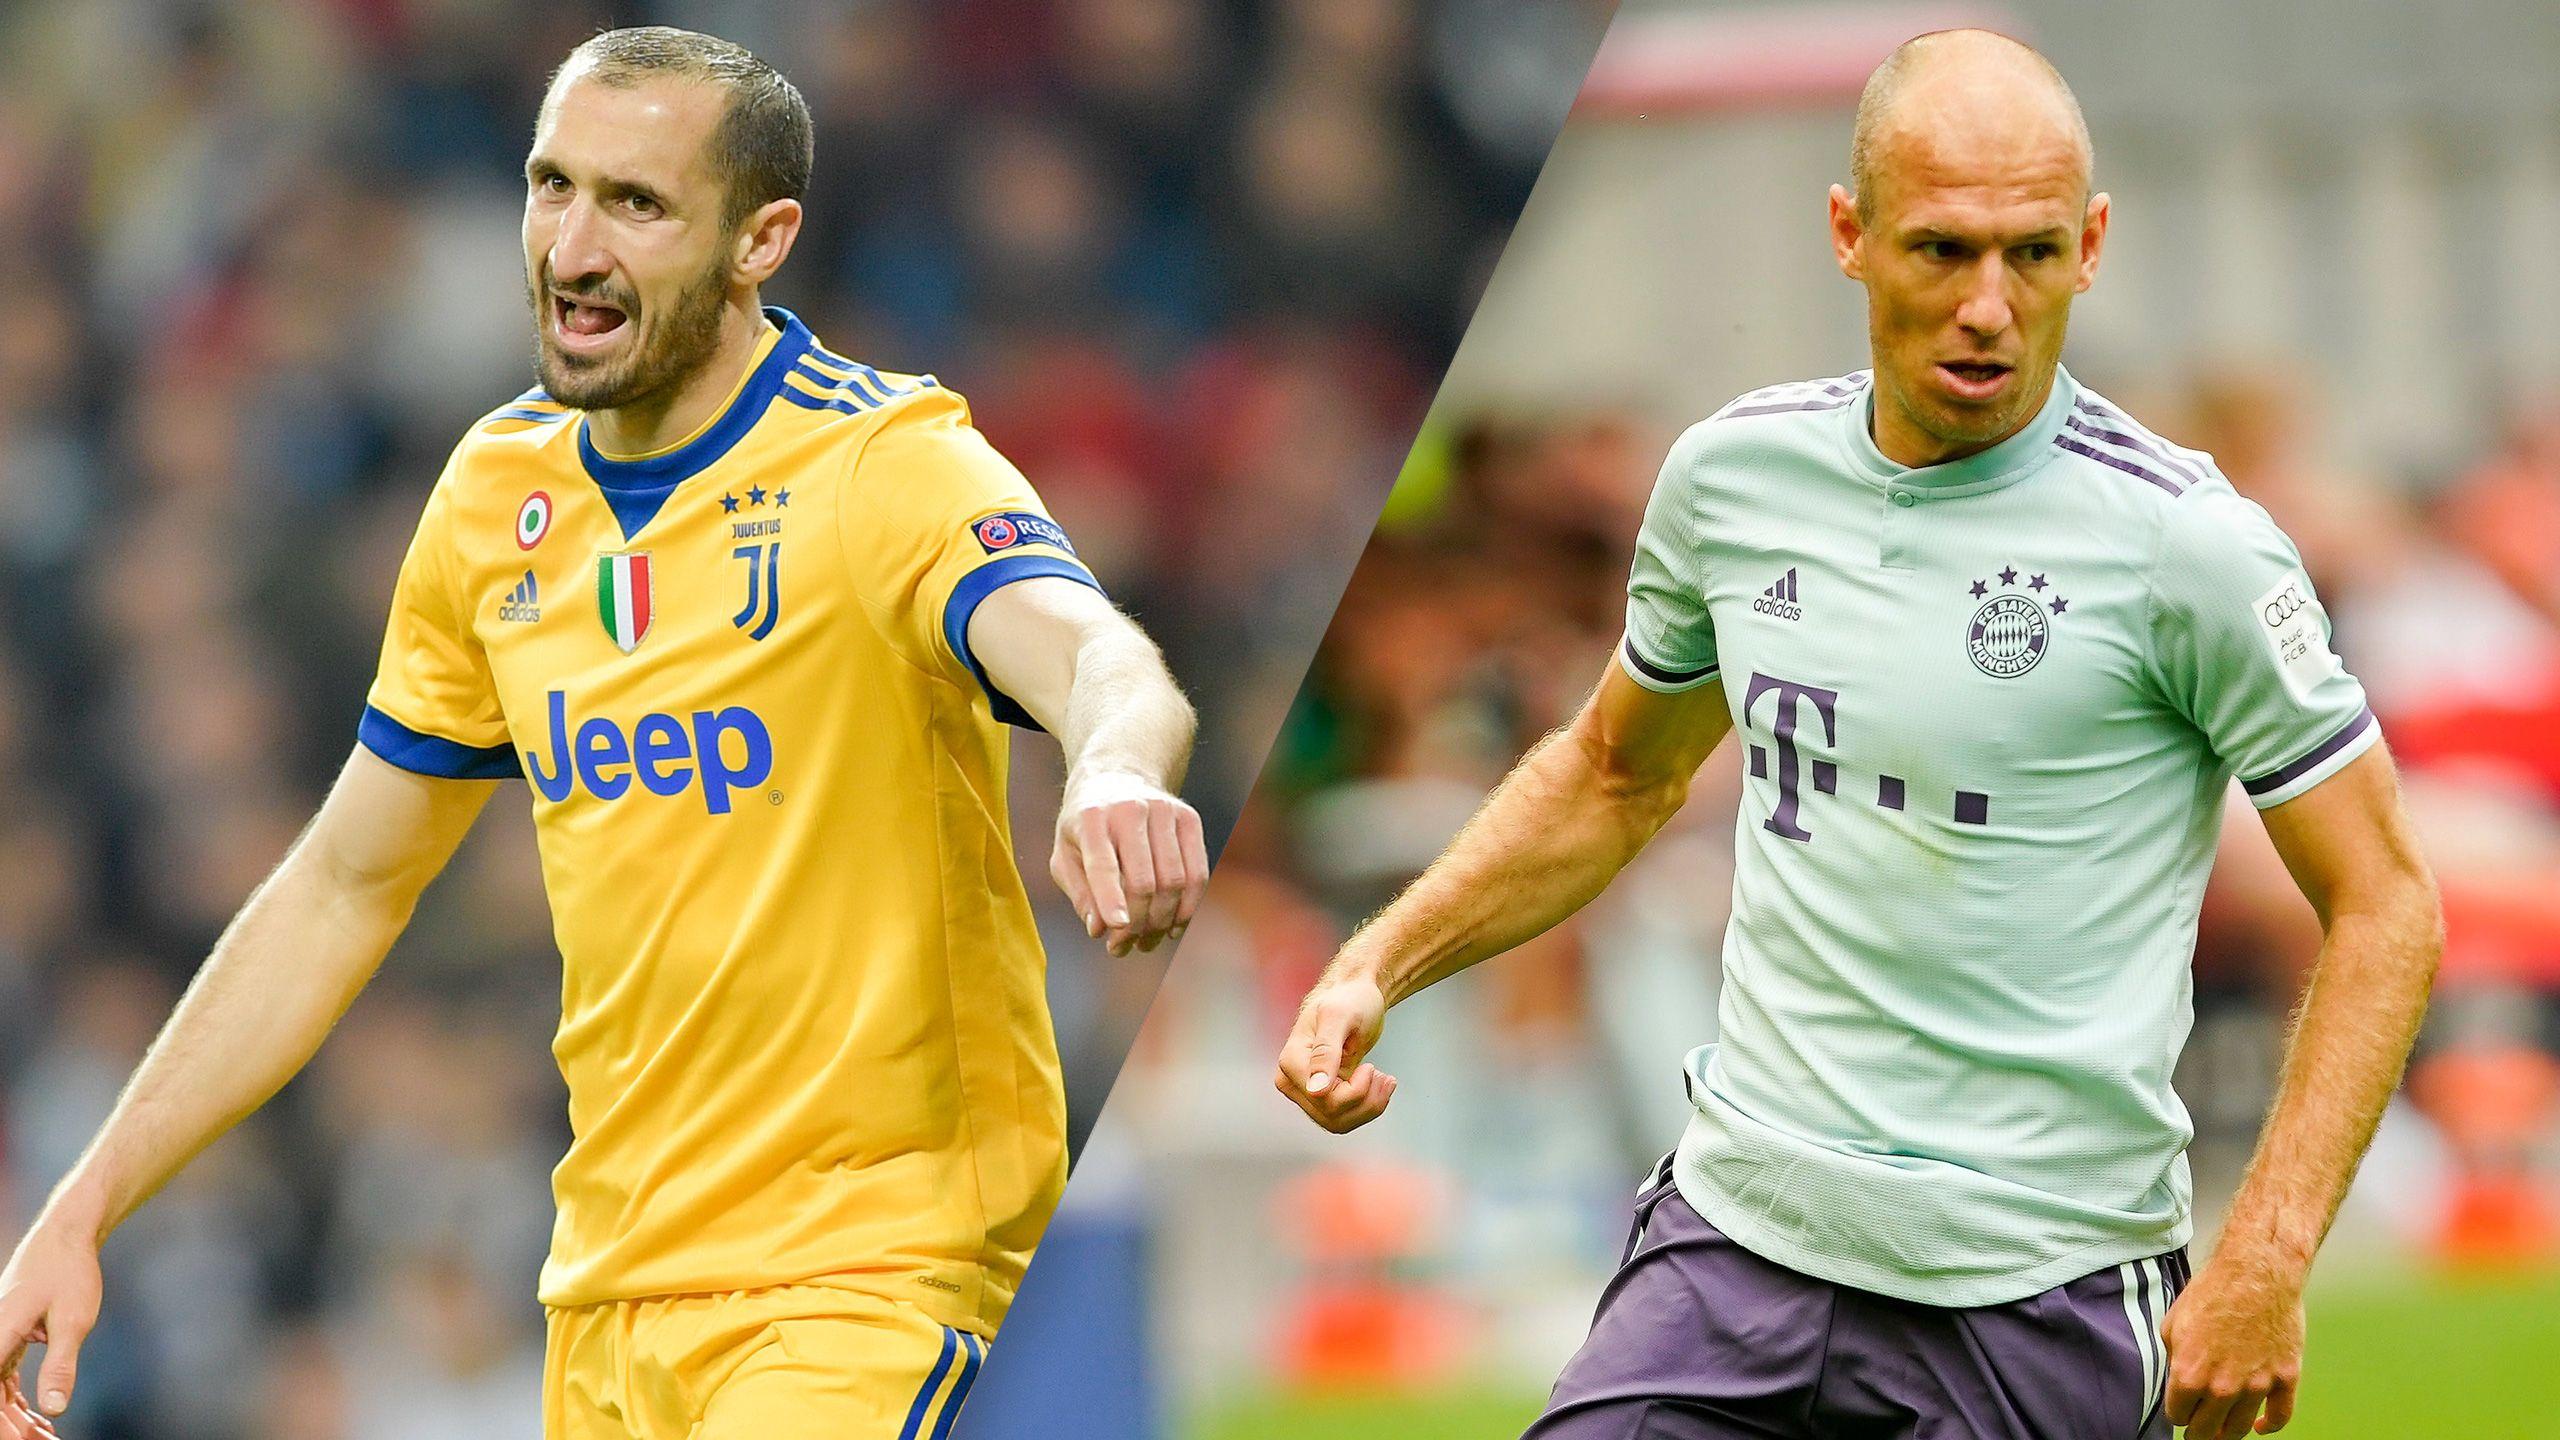 In Spanish - Juventus vs. Bayern Munich (International Champions Cup)